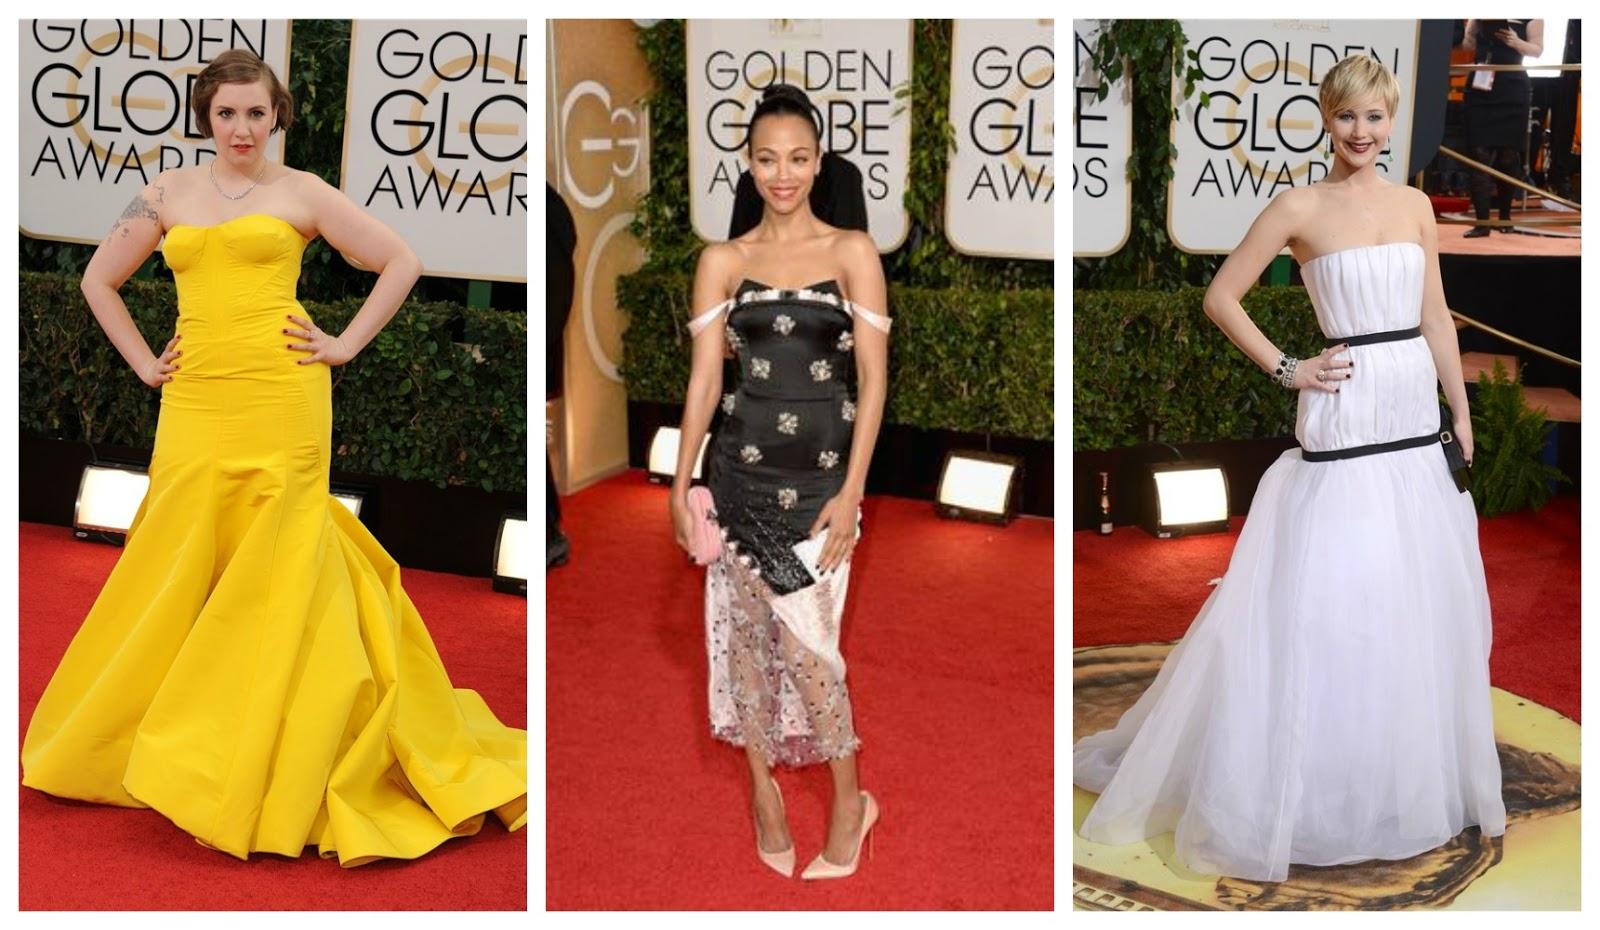 Lena, Zoe, y Jennifer Globos de oro 2014